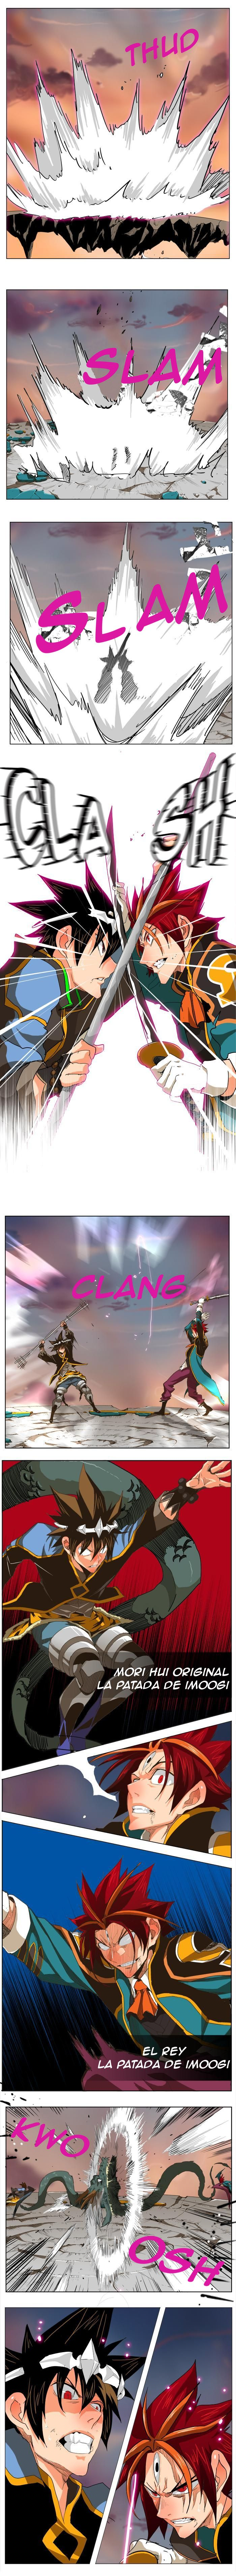 http://c5.ninemanga.com/es_manga/37/485/484868/fecf2c550171d3195c879d115440ae45.jpg Page 3